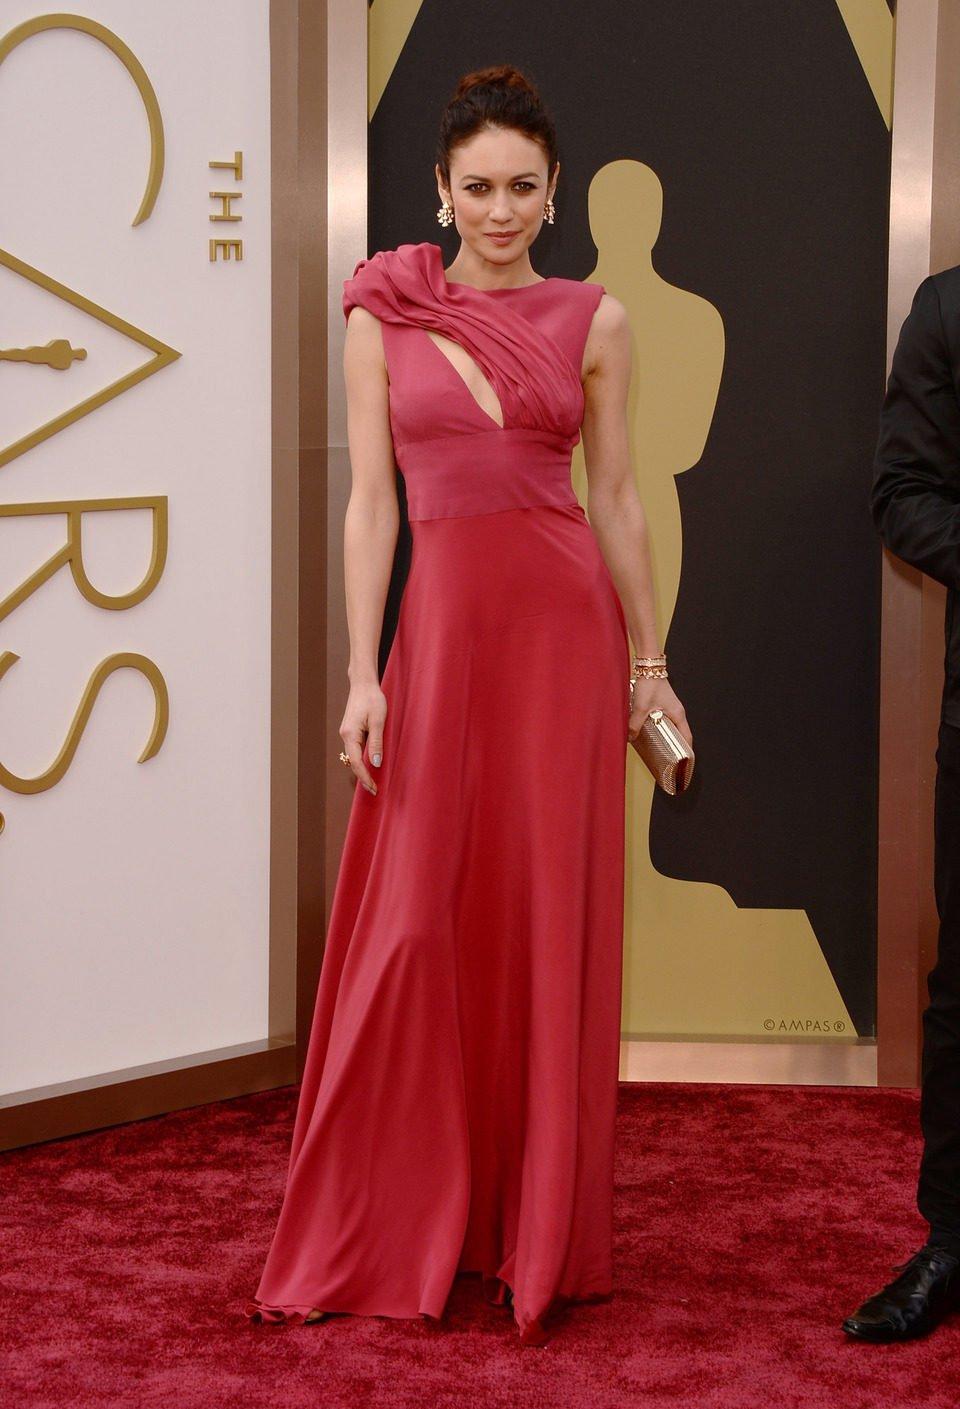 Olga Kurylenko at the 2014 Oscars red carpet